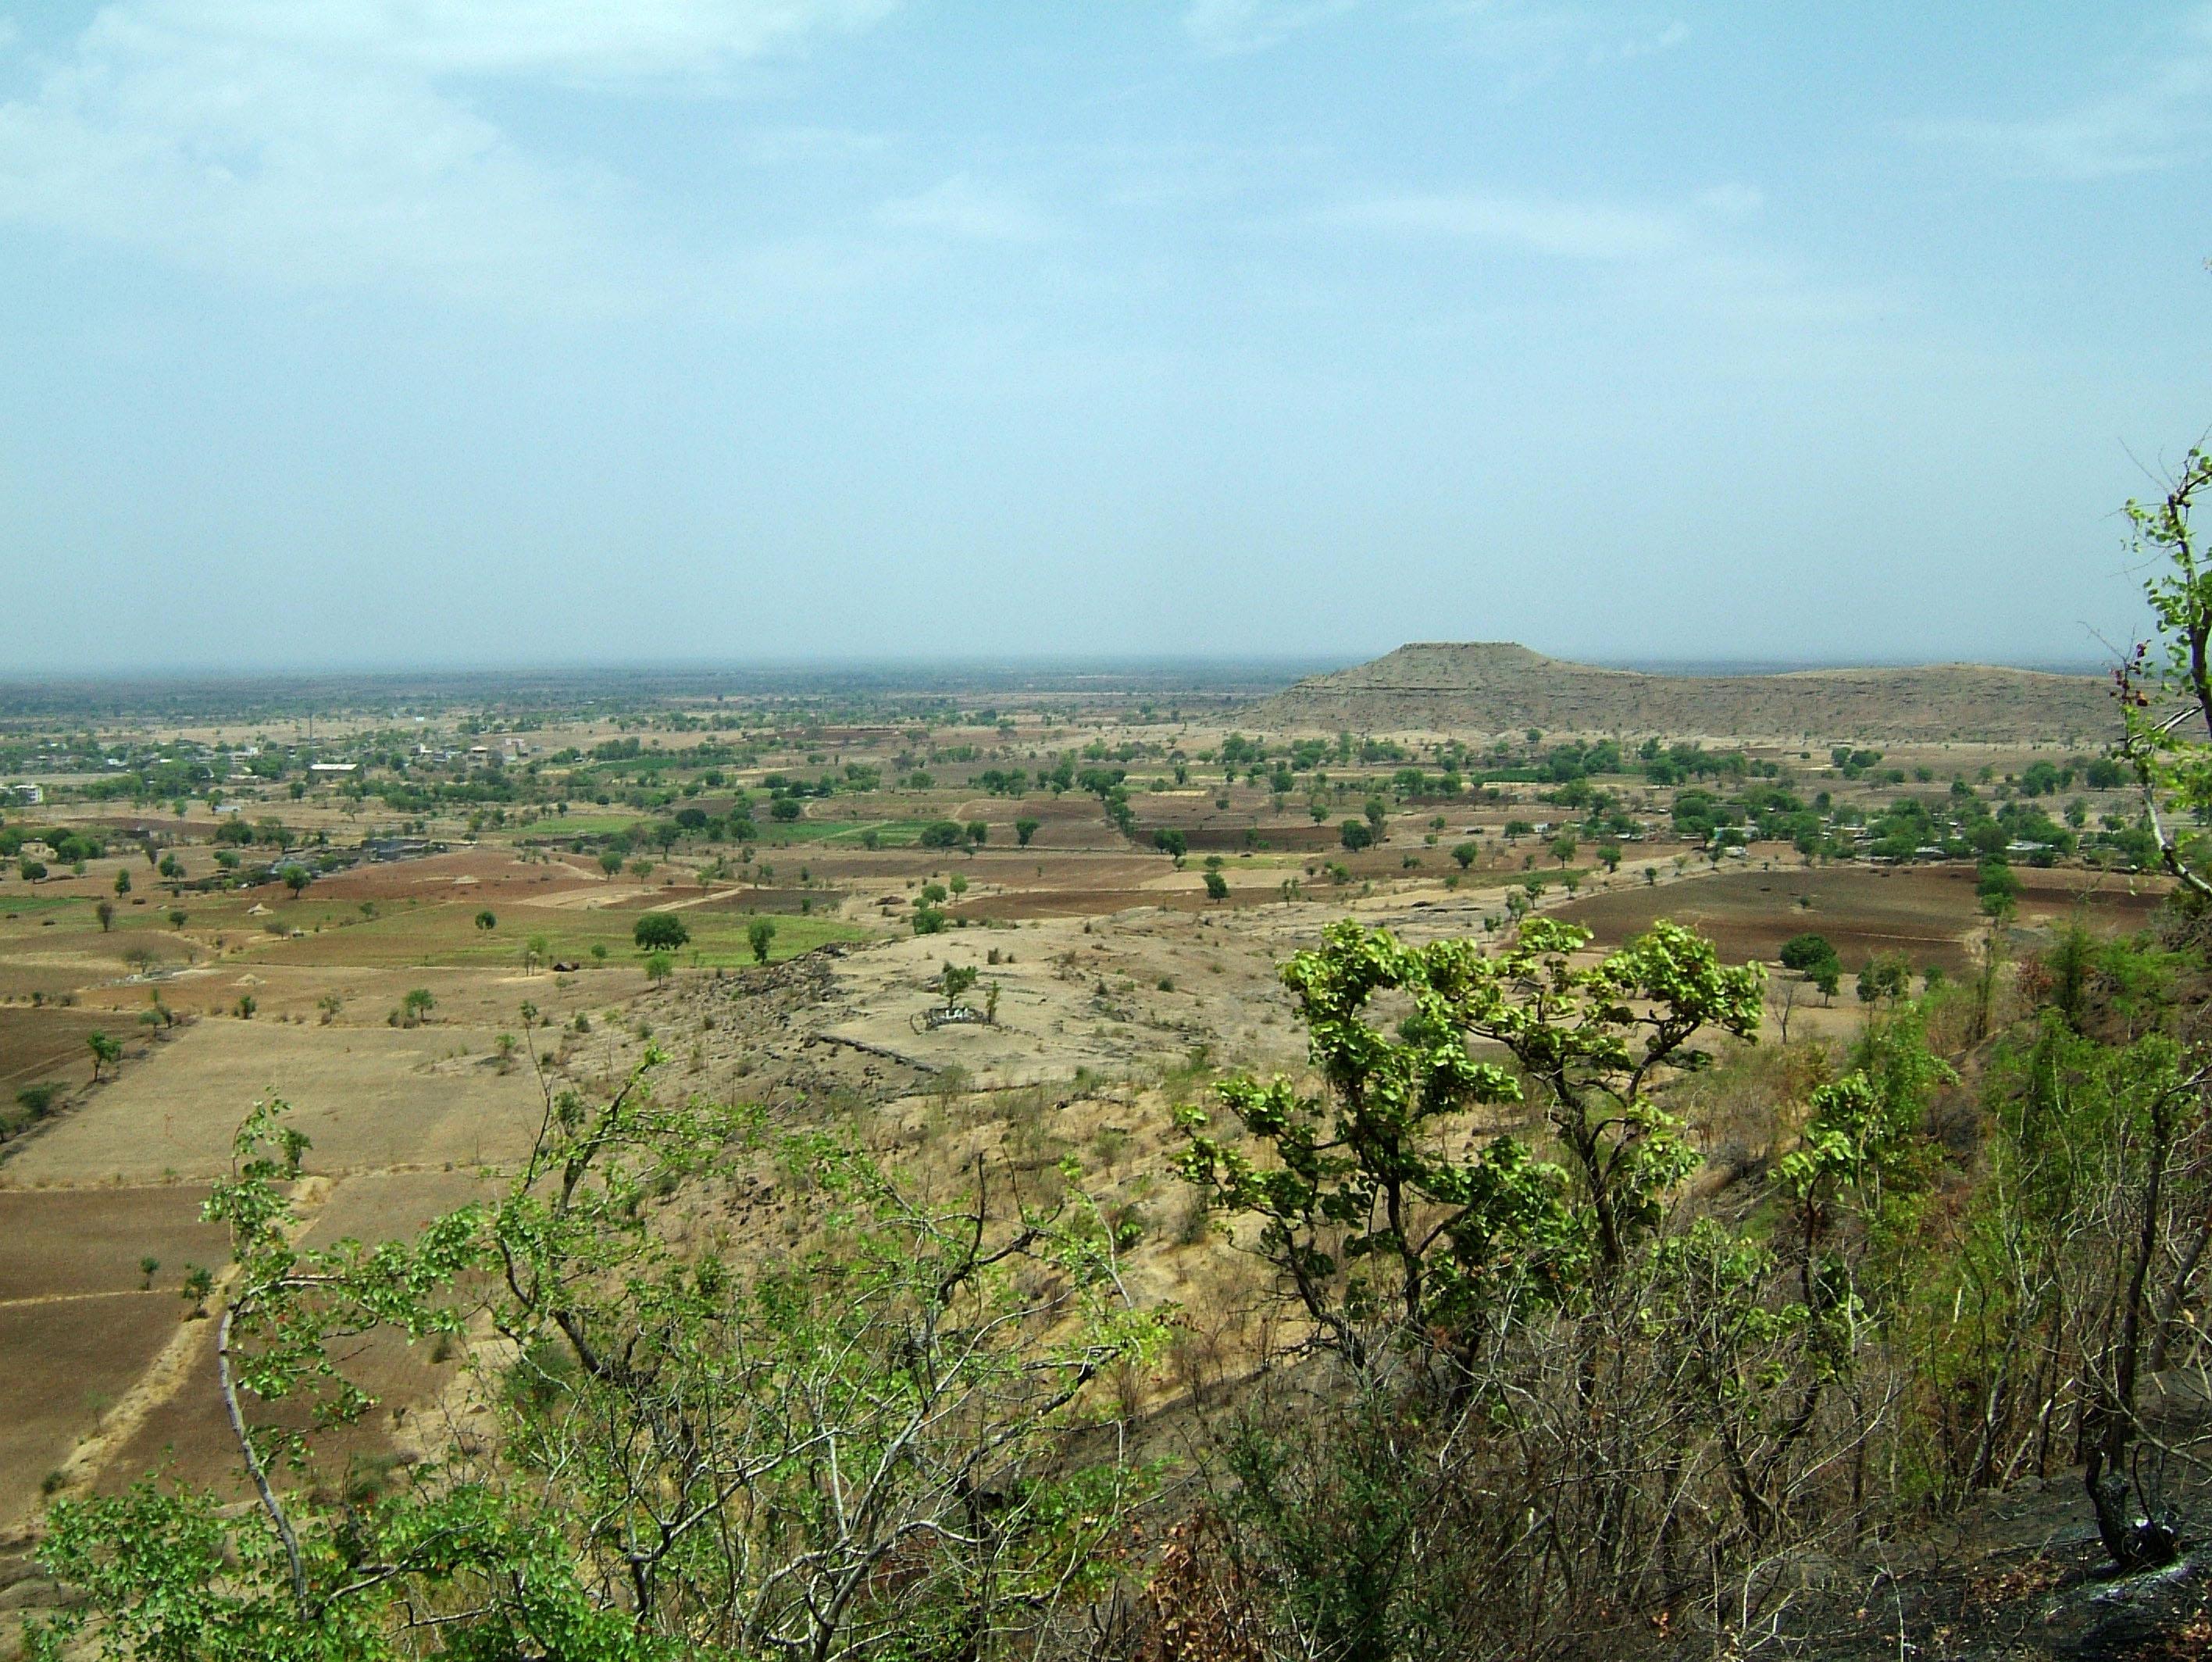 Aurangabad to Ajanta Caves by road India Apr 2004 04